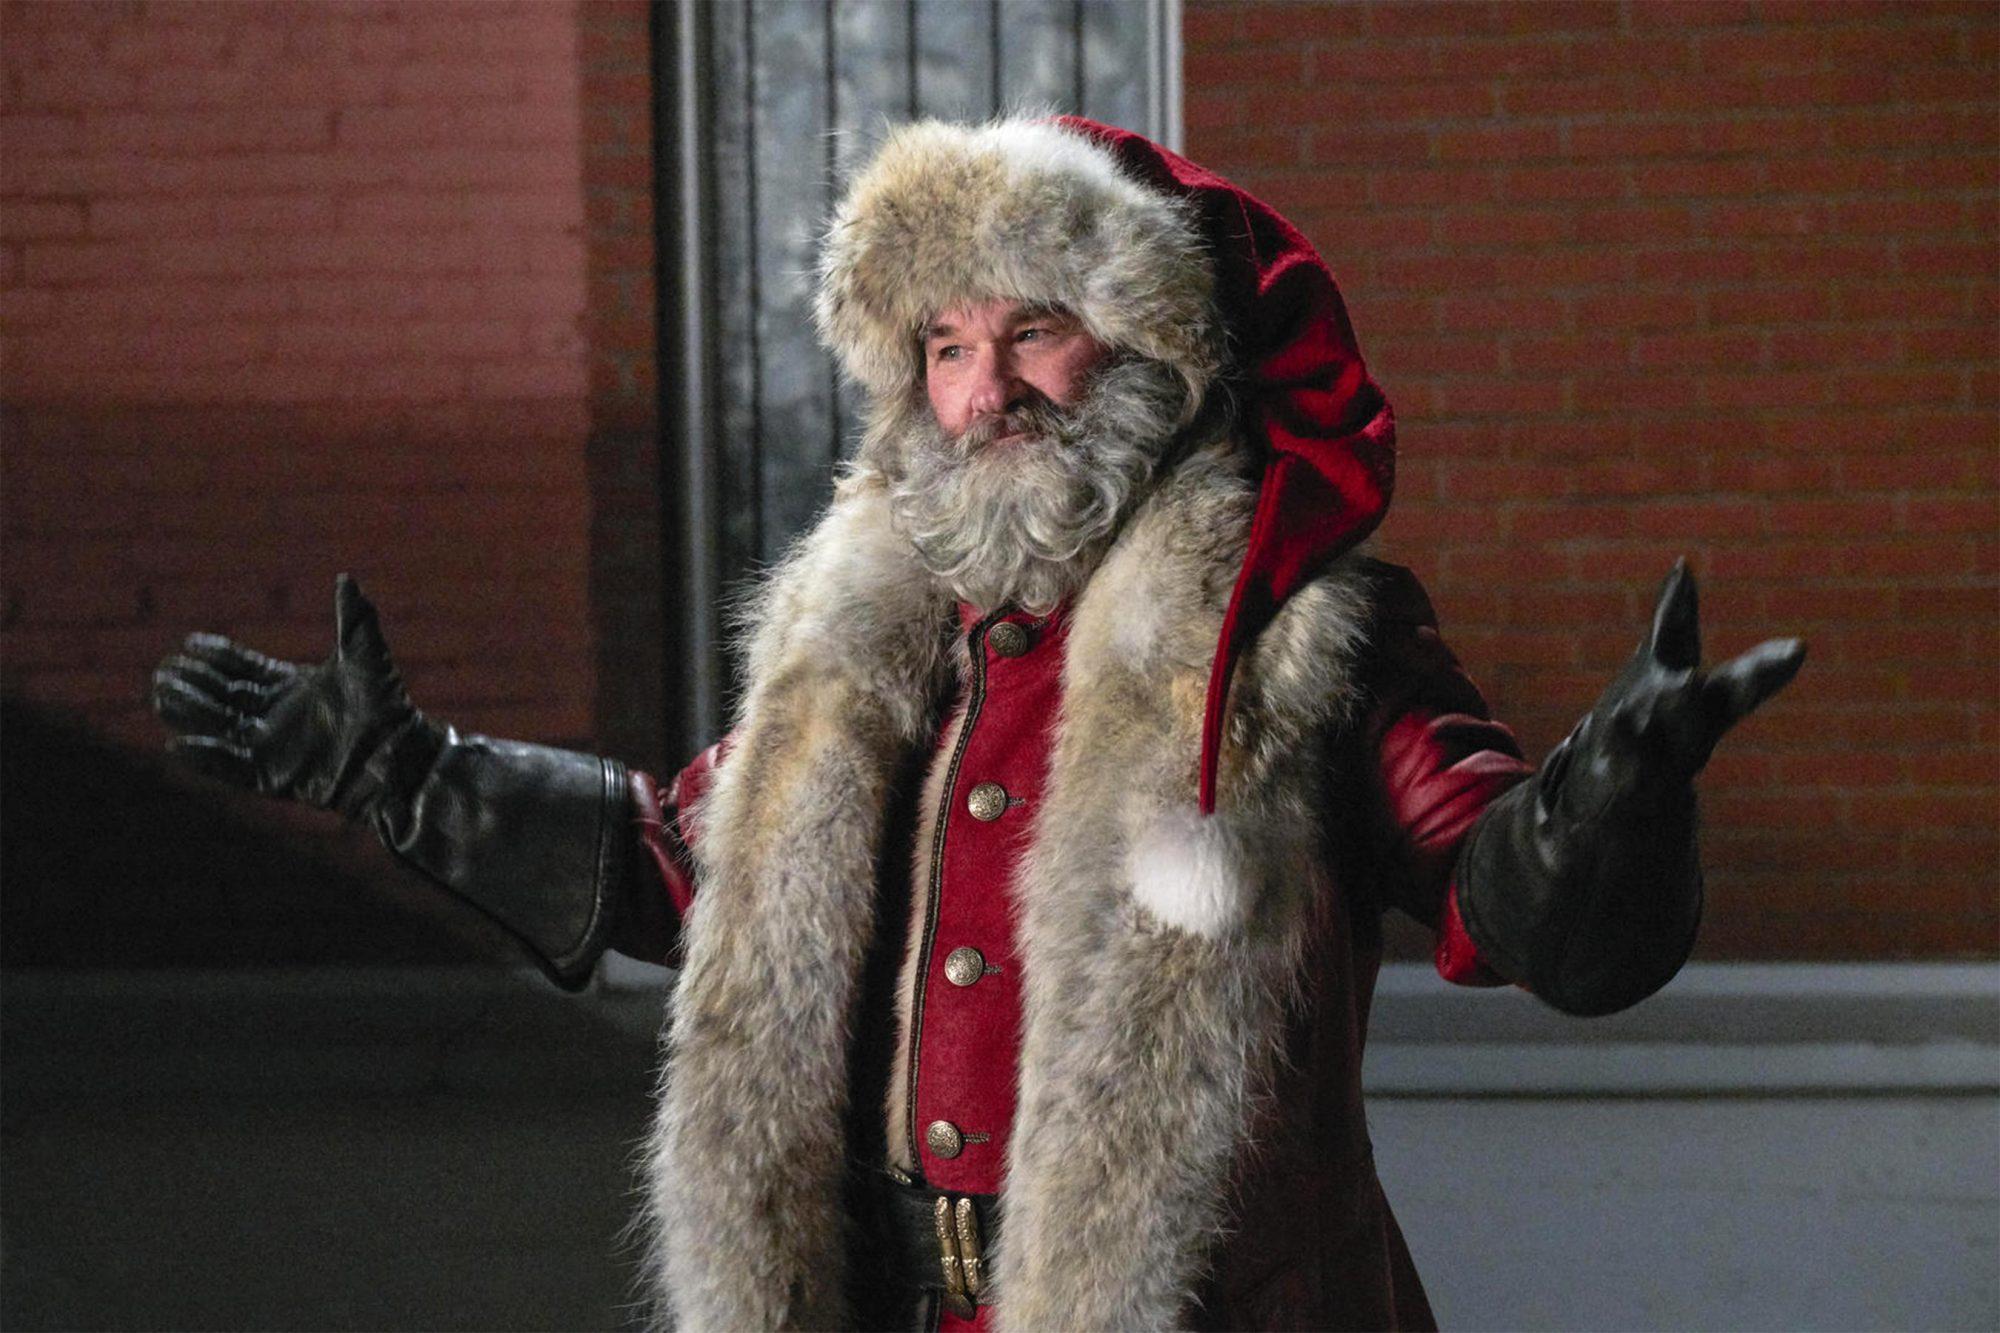 The Christmas ChroniclesKurt Russell as a wisecracking Santa Claus CR: Netflix